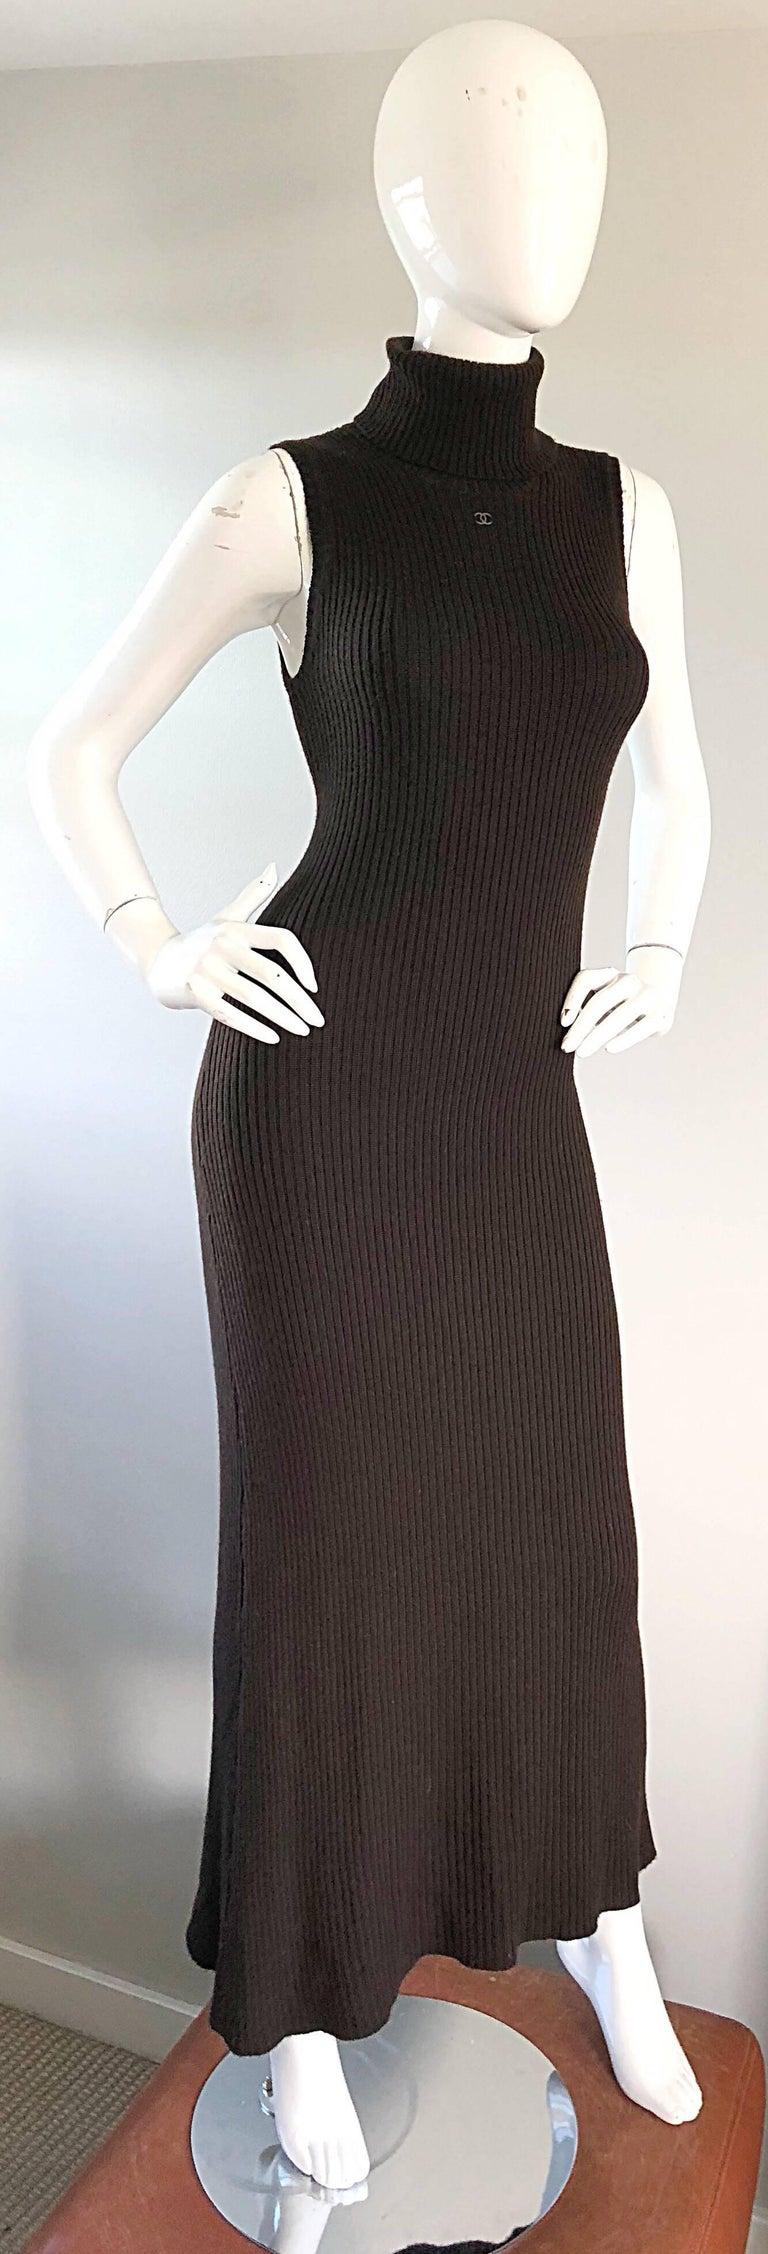 Chanel Vintage 99A Espresso Brown Cashmere Turtleneck 1990s 90s Sweater Dress 5